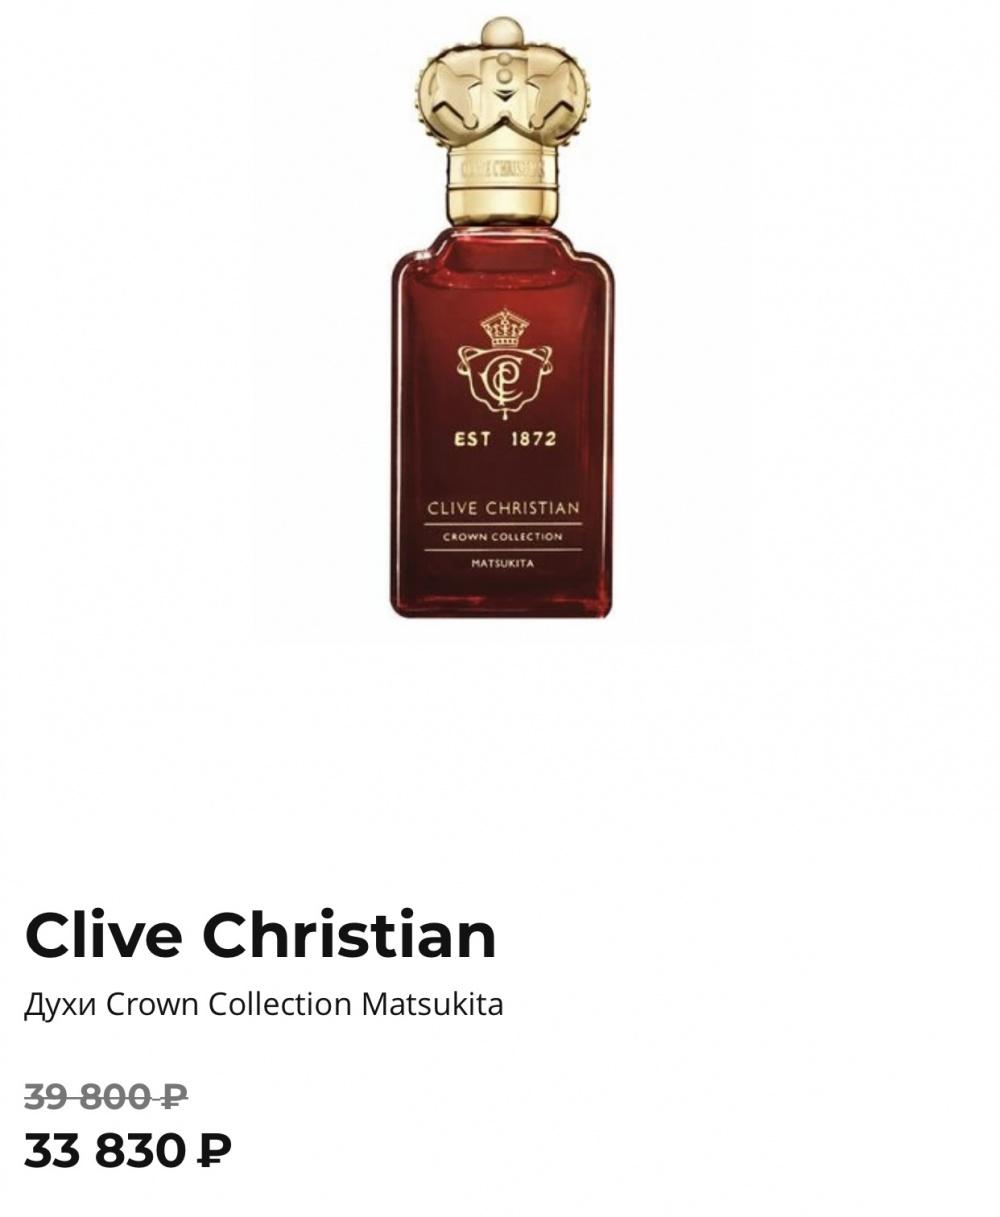 Набор Clive Christian пробники Matsukita и crab apple blossom 2*2ml